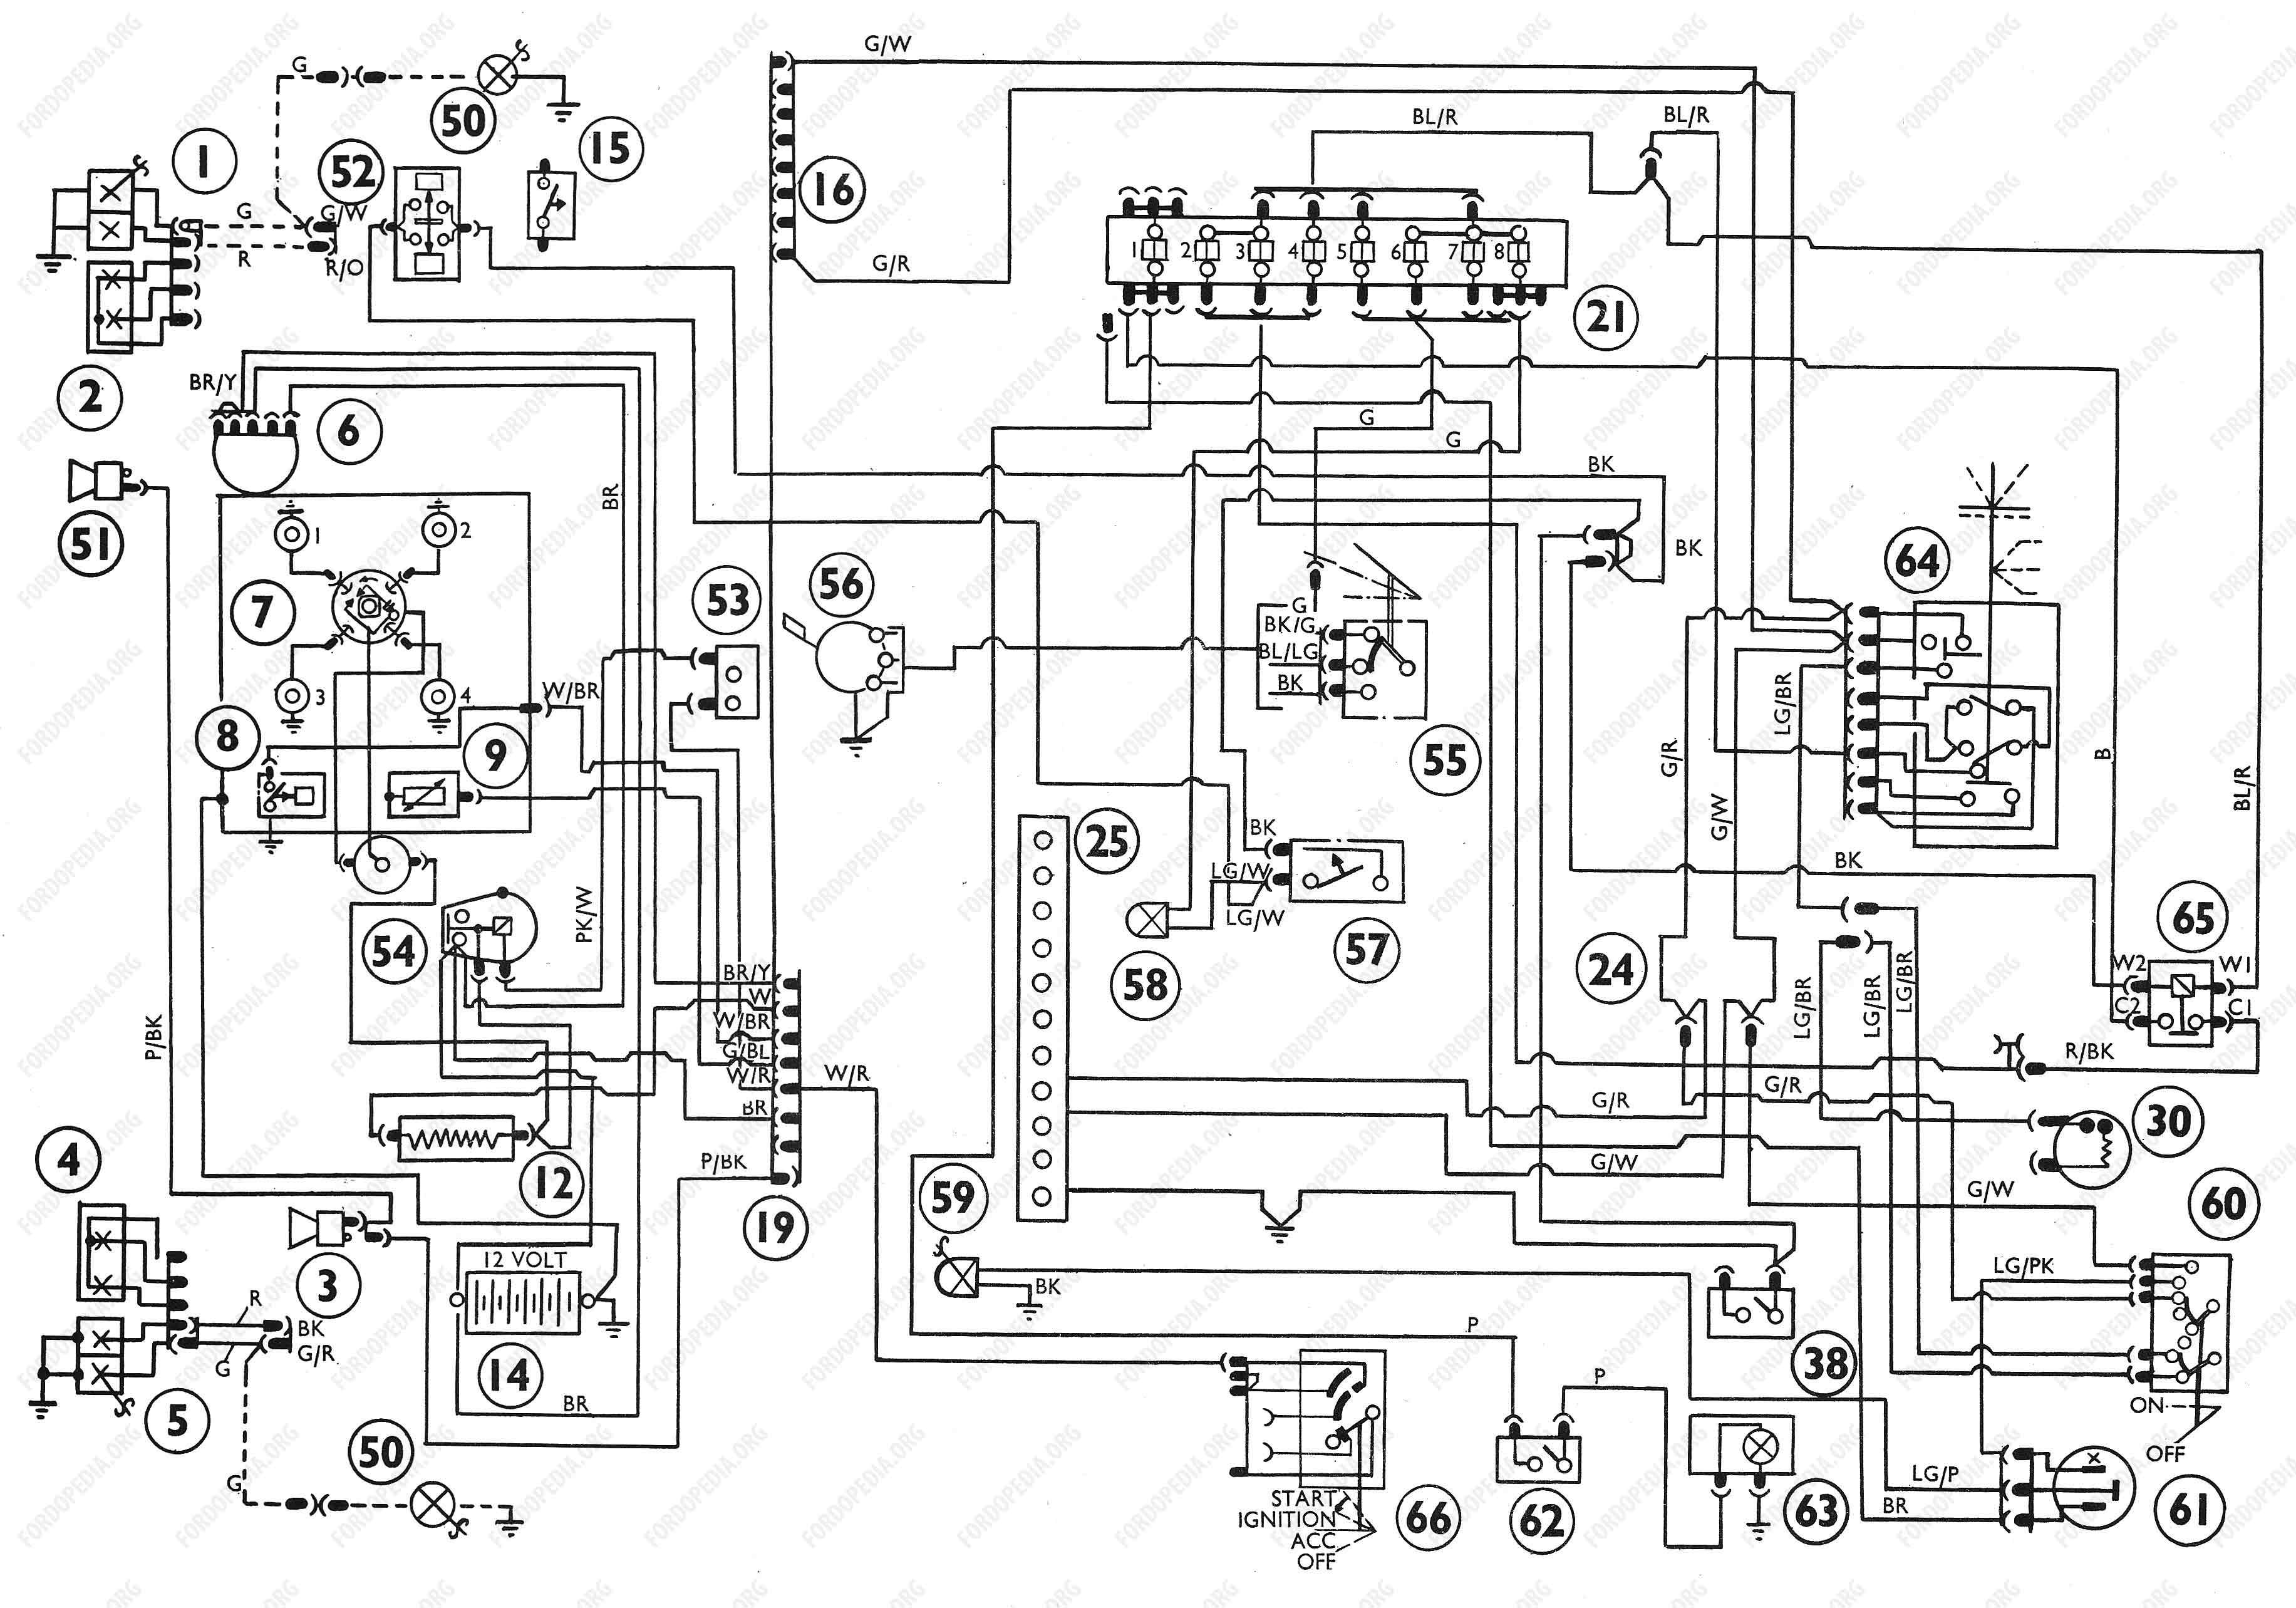 Ford Transit Connect Wiring Diagram: Ford Transit Wiring Diagram - Wiring Diagram Insiderh:8.ynhu.beate-brueckenbauerin.de,Design